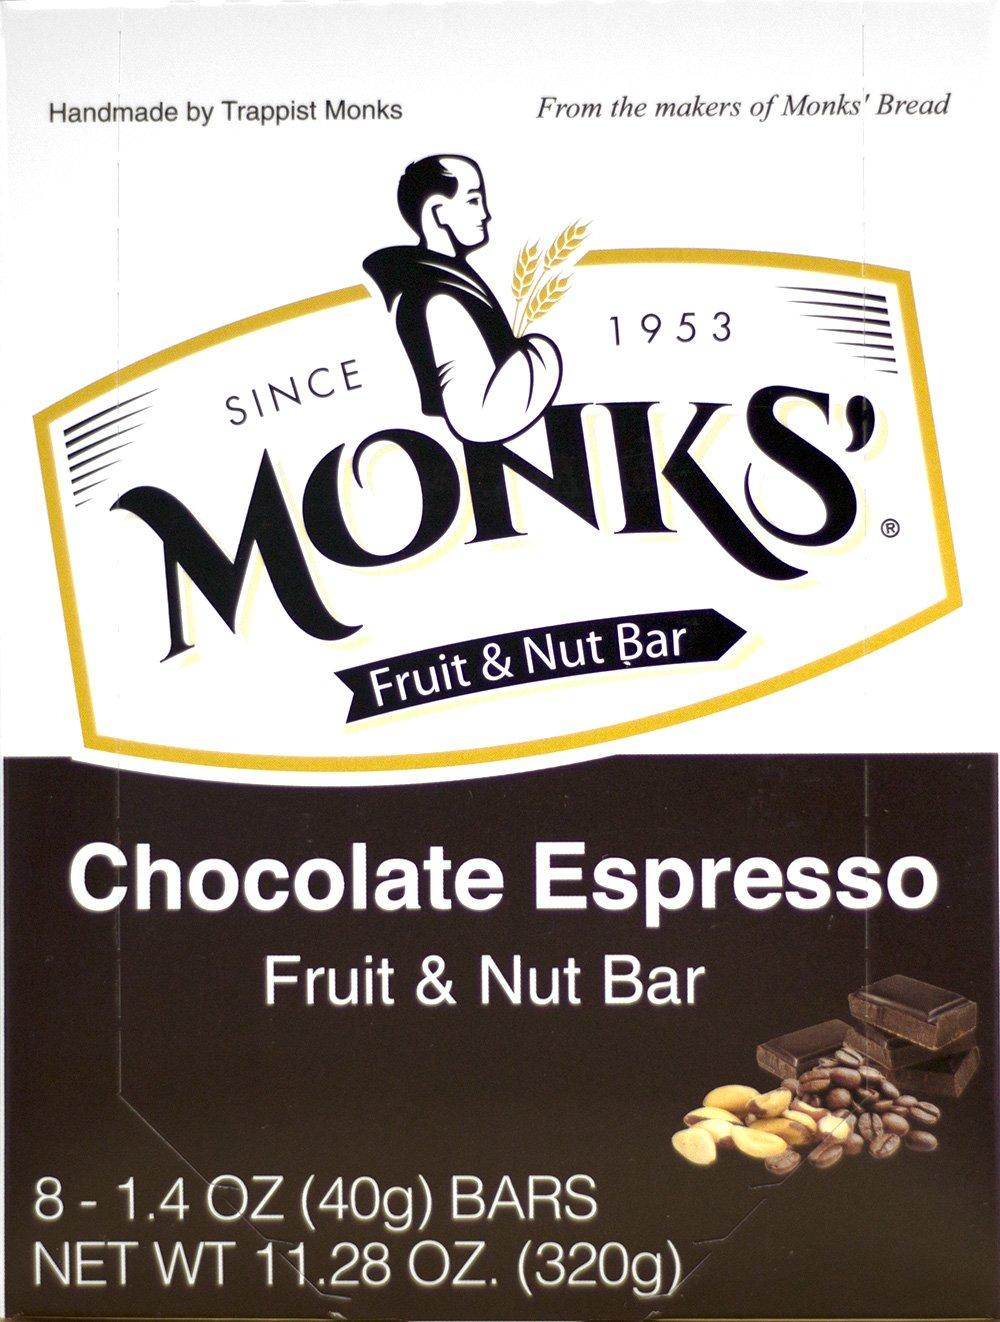 Monks' Chocolate Espresso Fruit & Nut Bars